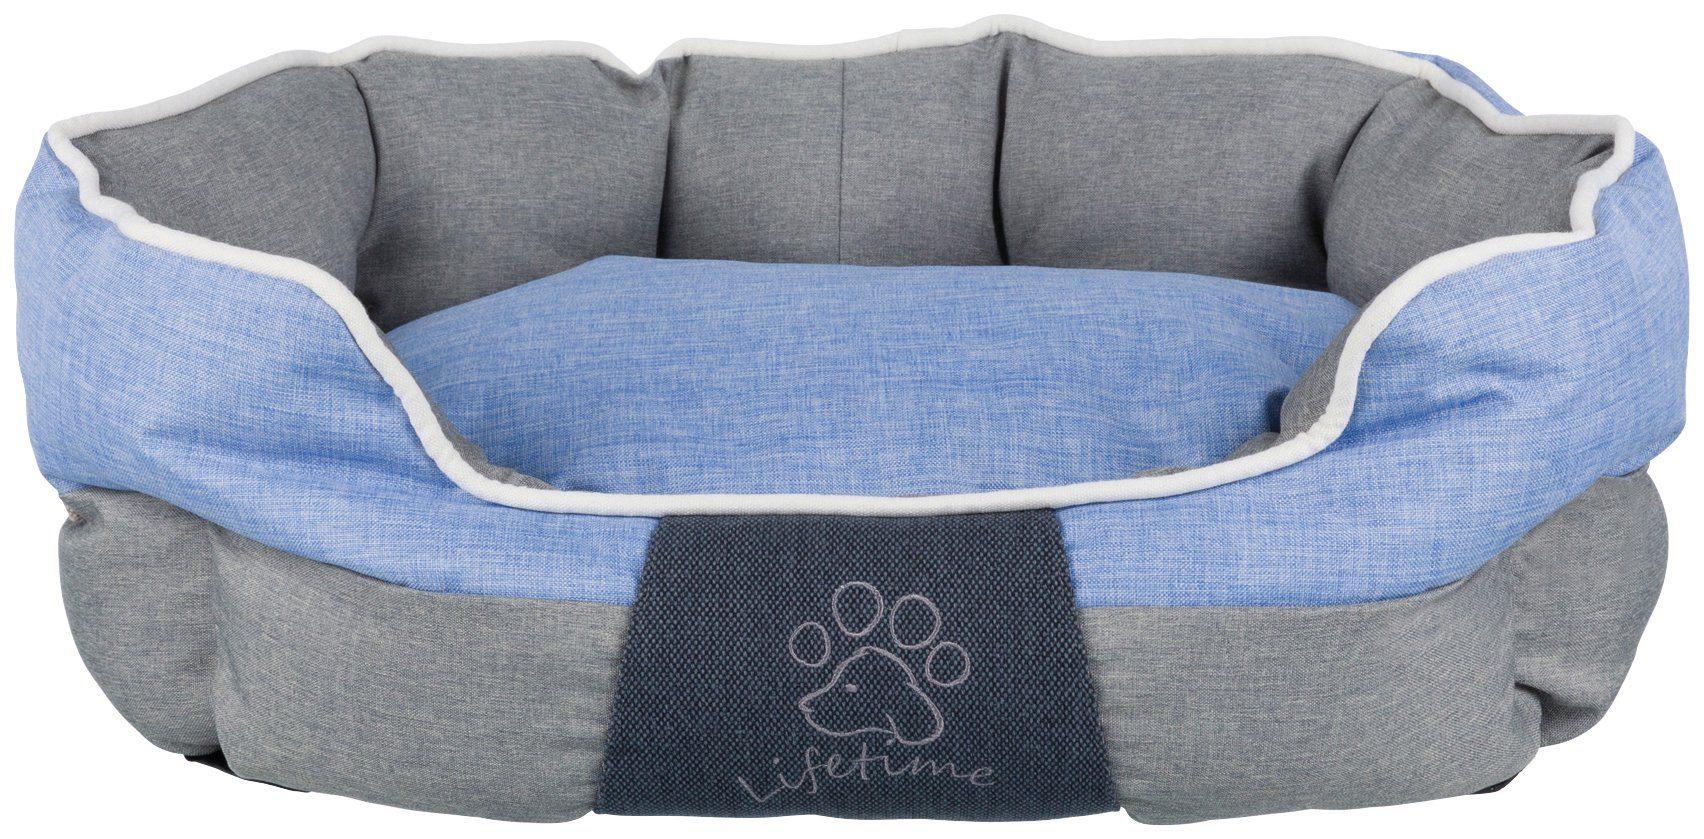 TRIXIE Hundebett und Katzenbett »Joris«, BxT: 75x60 cm, grau/blau